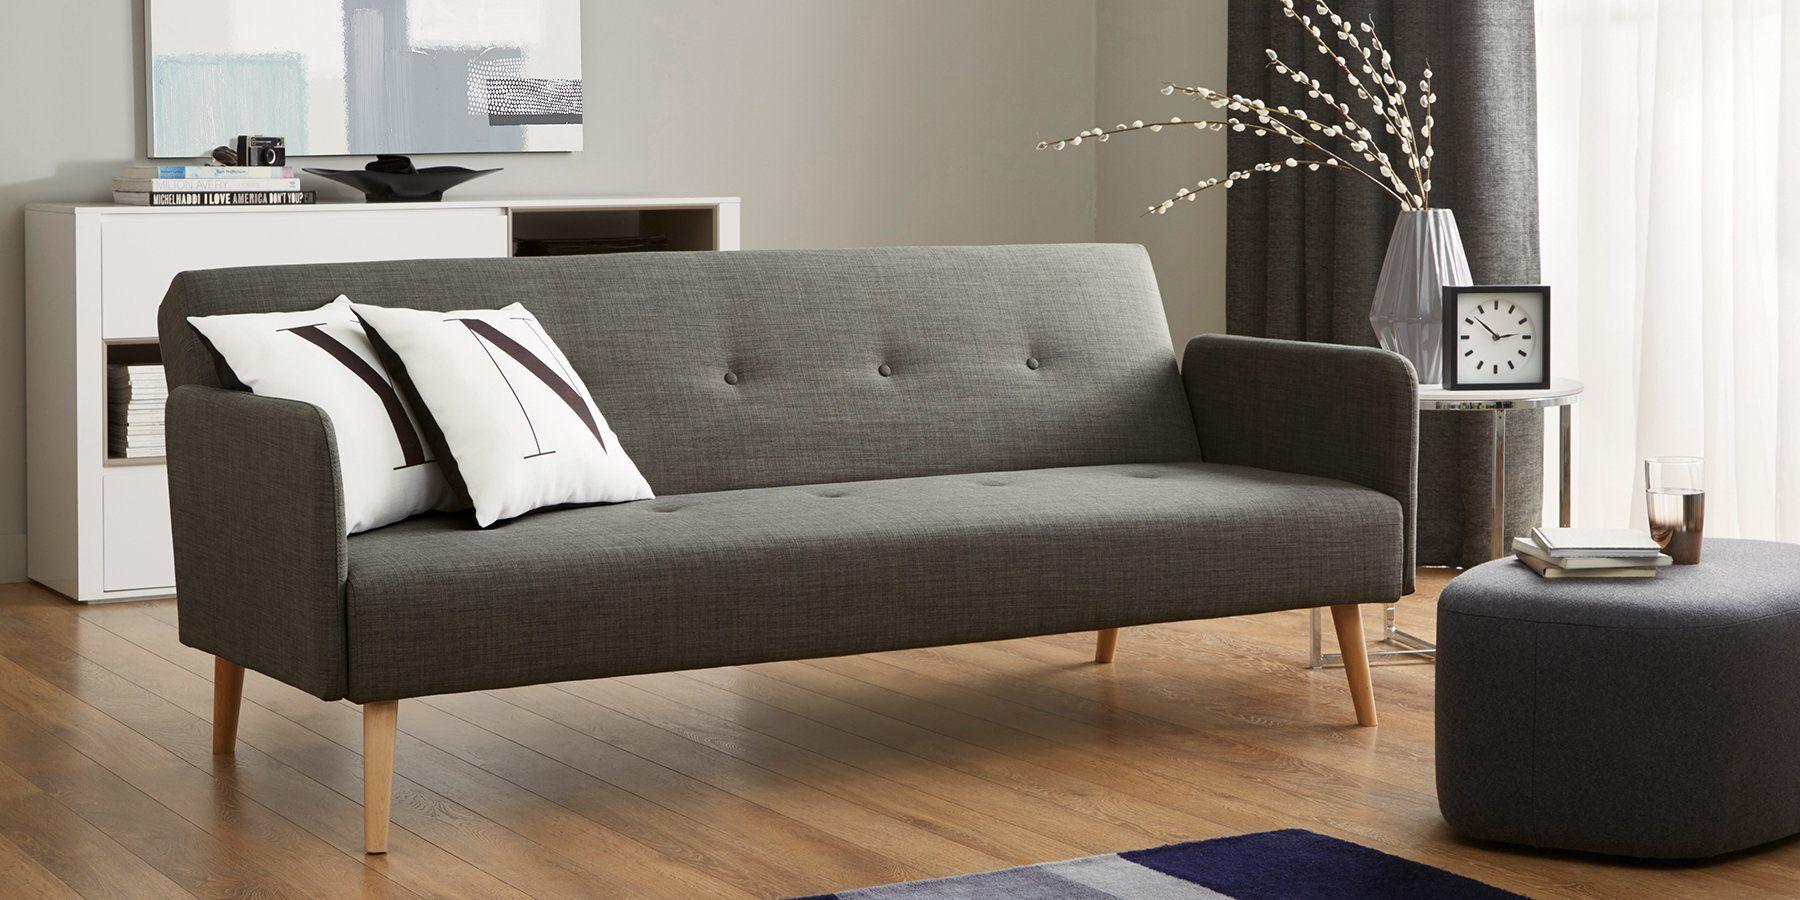 Best Buy Finnley Occasional Sofa Bed Medium 2 People Simple 400 x 300